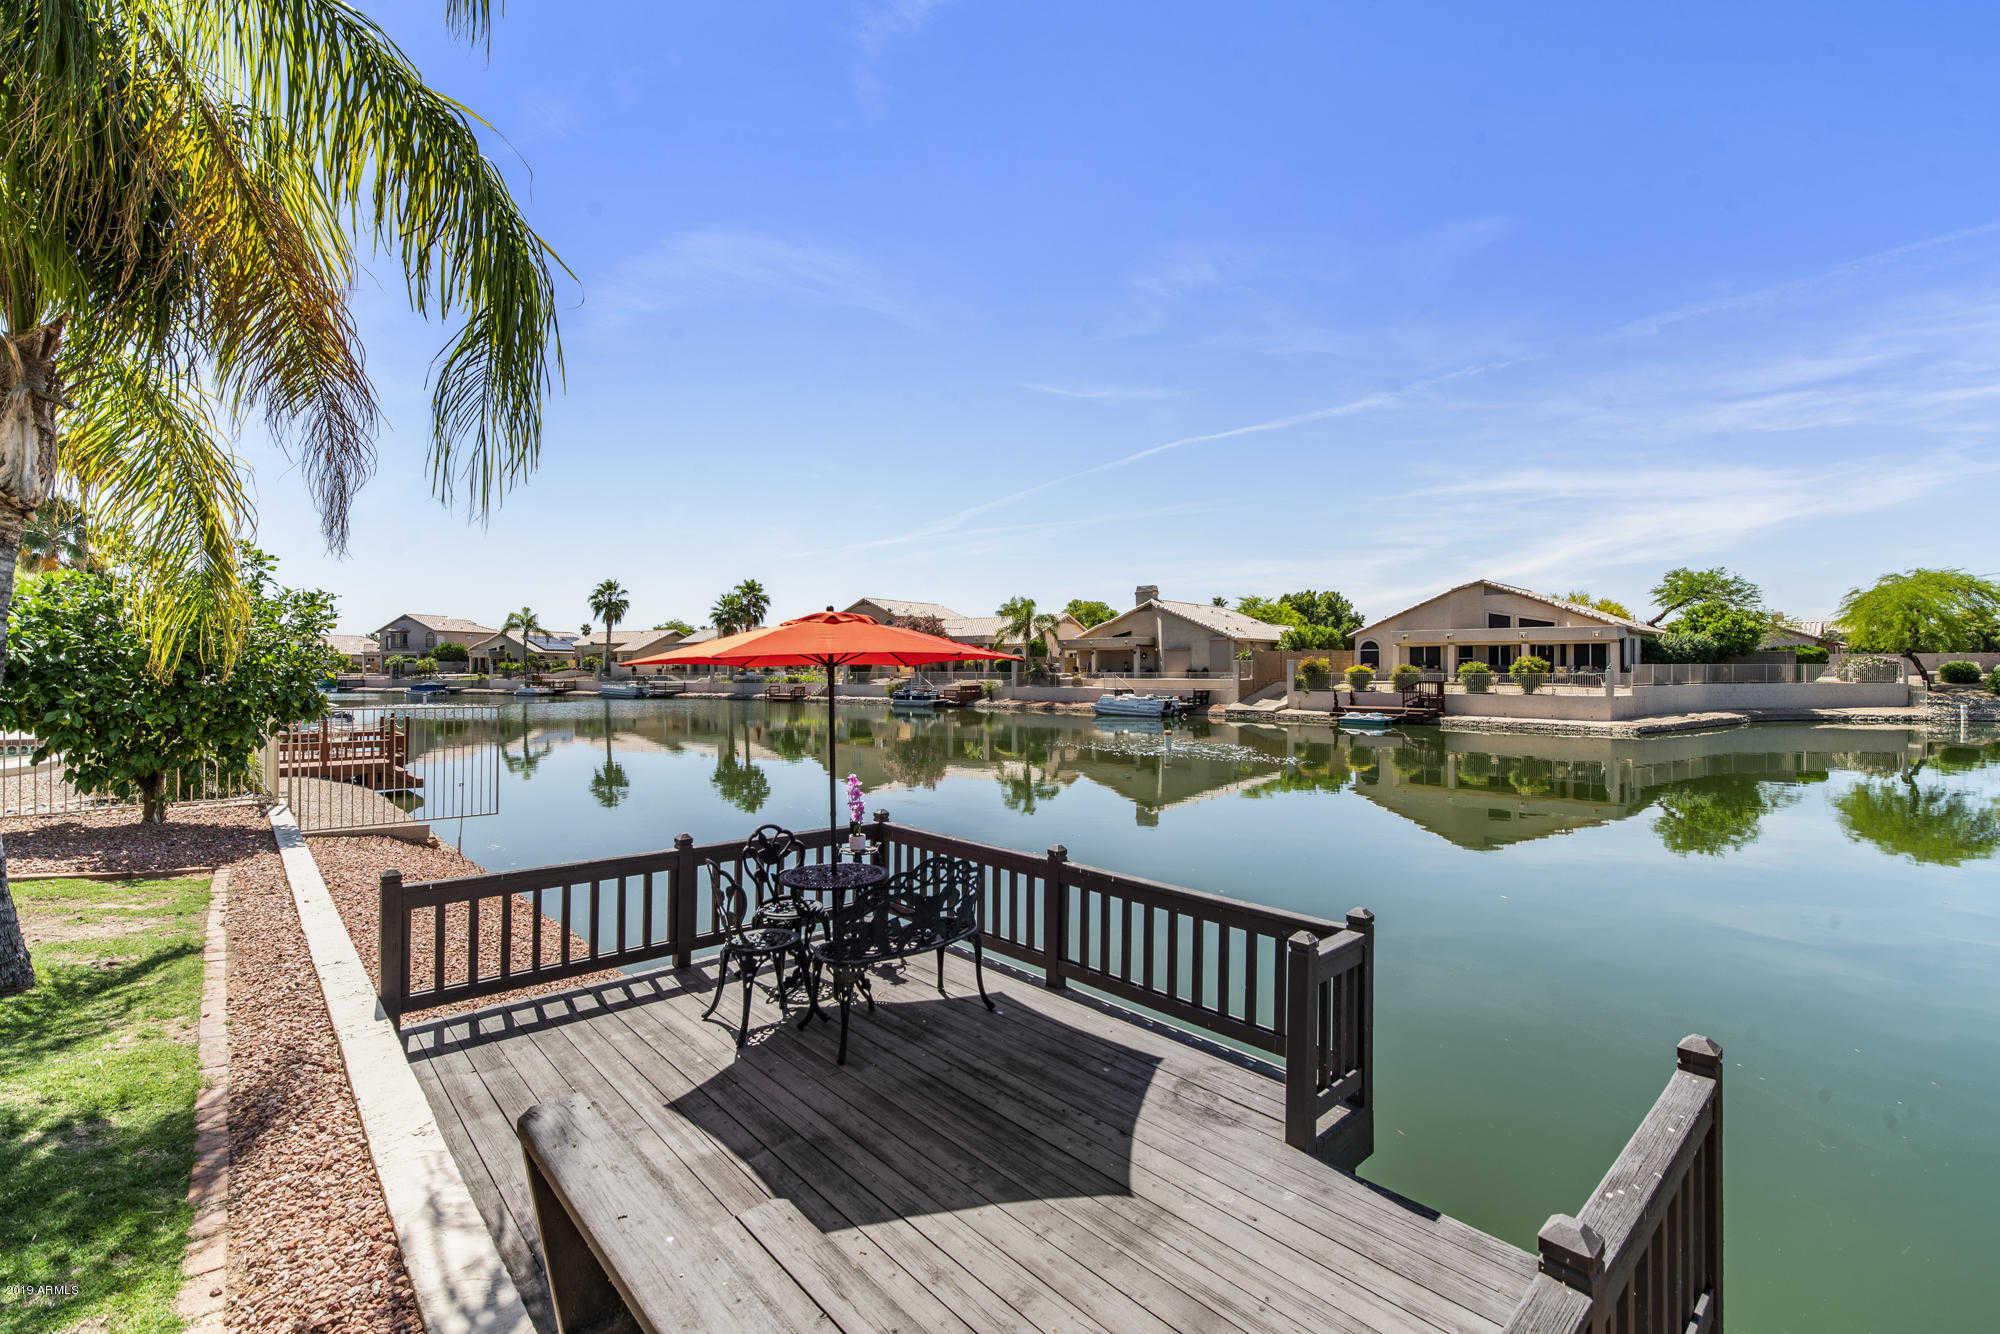 $554,000 - 4Br/3Ba - Home for Sale in Arrowhead Lakes Unit 5b, Glendale